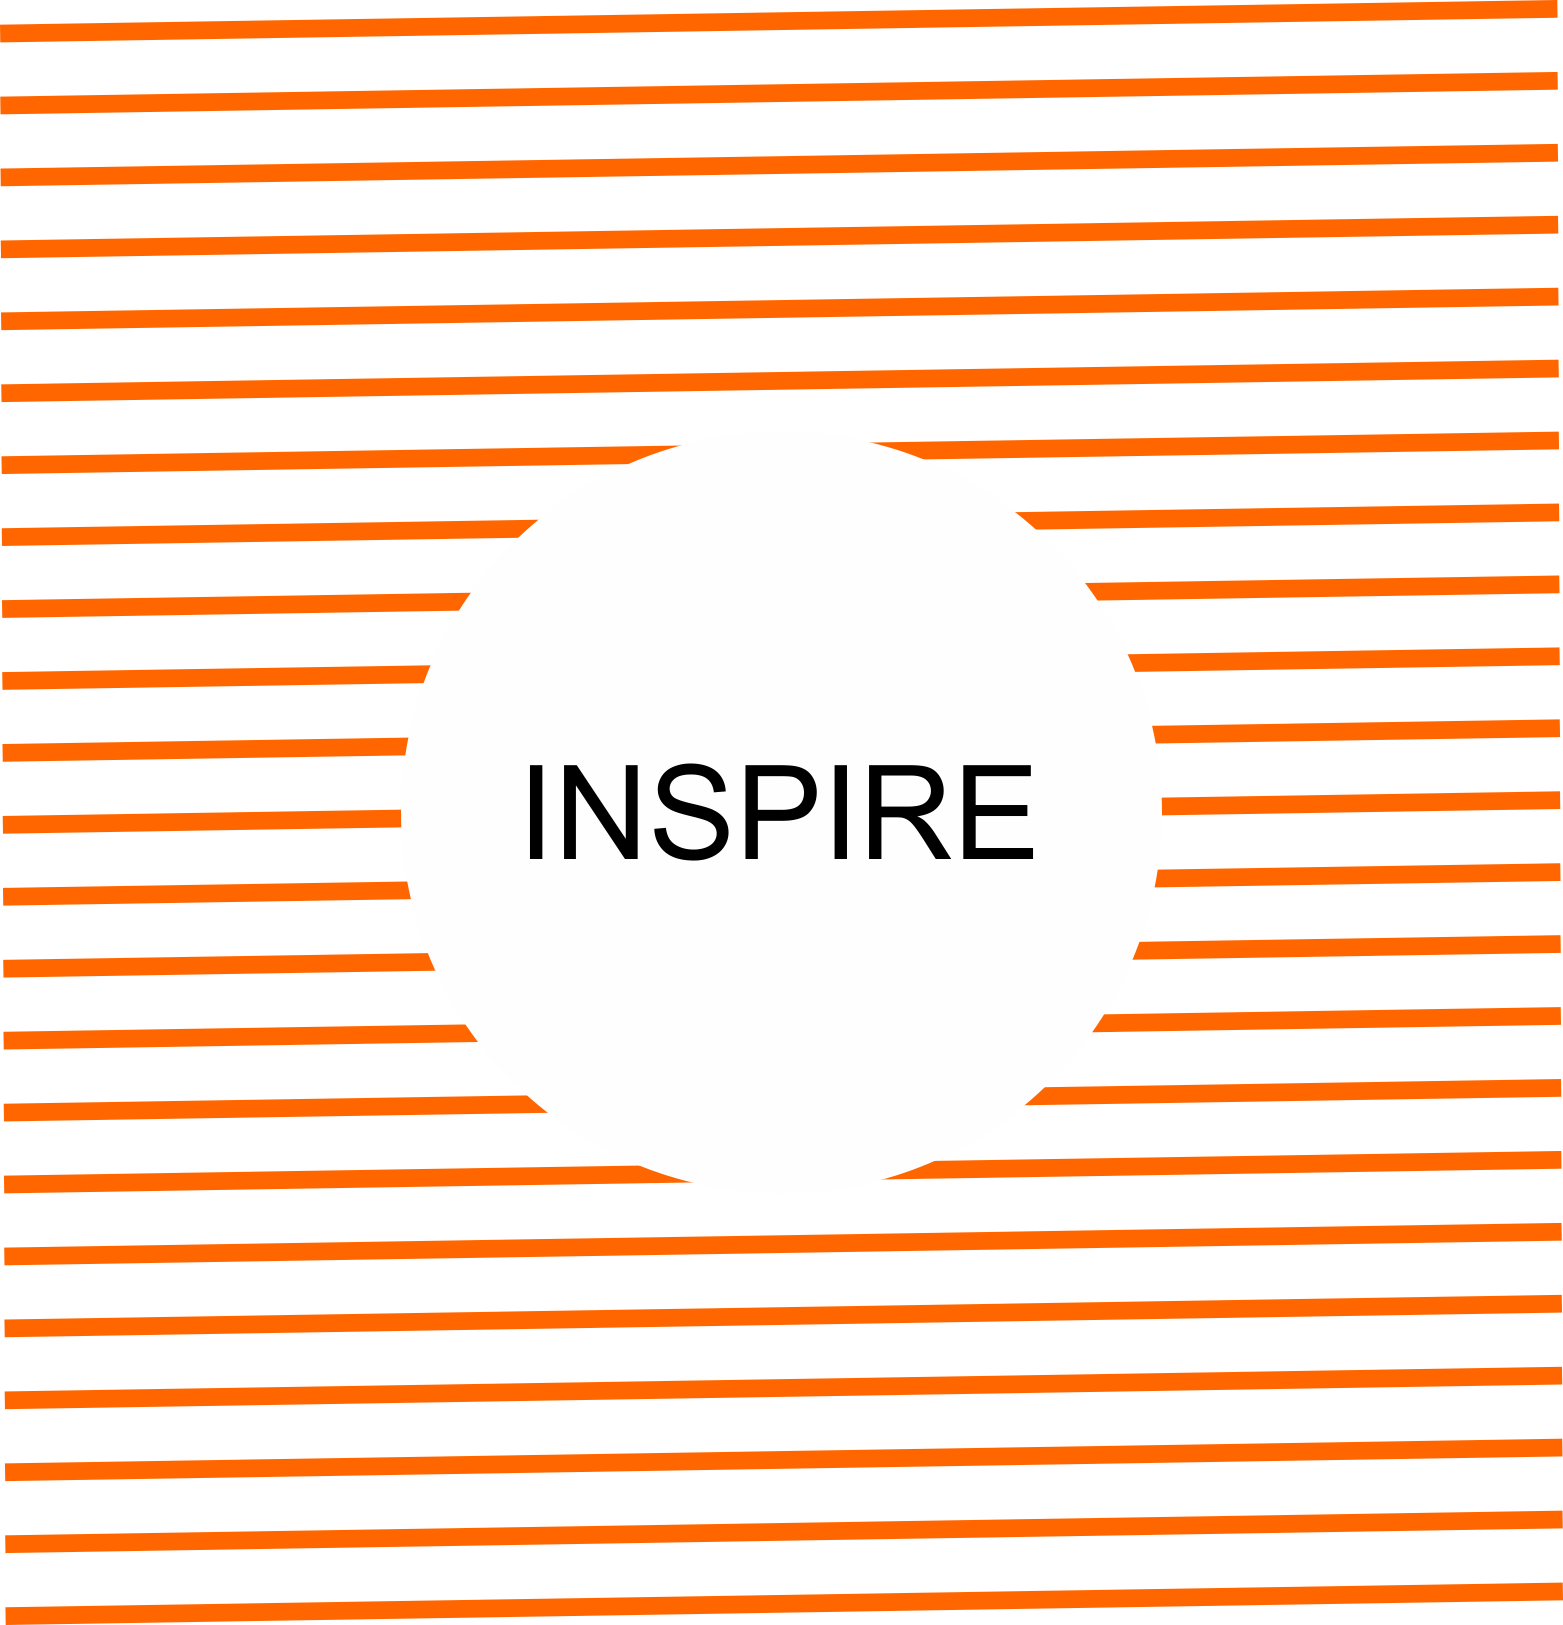 inspire tab